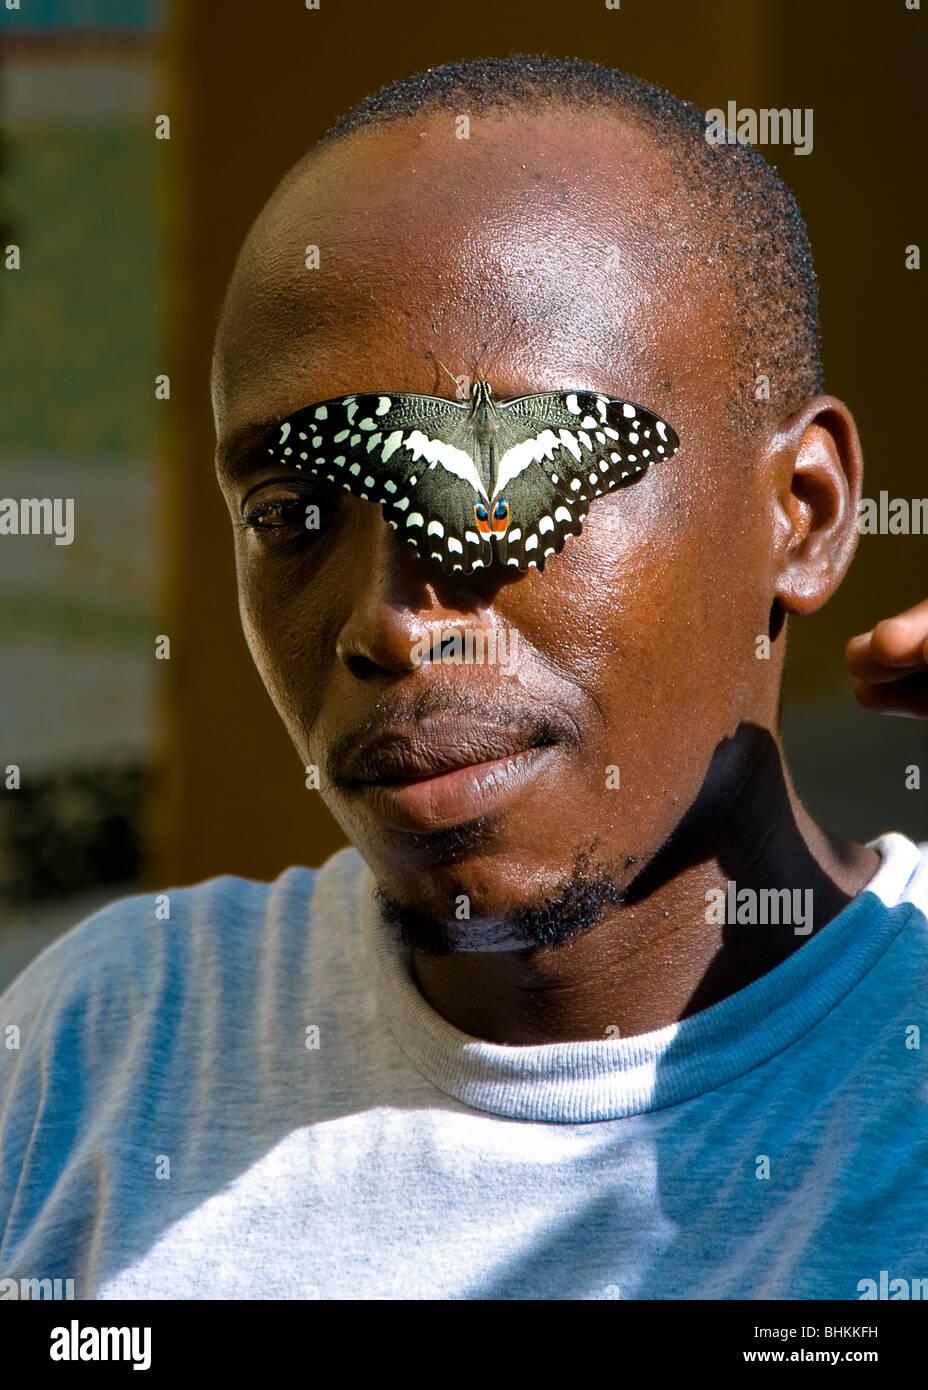 Hombre con Mariposa, Kipepeo Butterfly House, las ruinas de Gedi, Kenya, Africa. Imagen De Stock